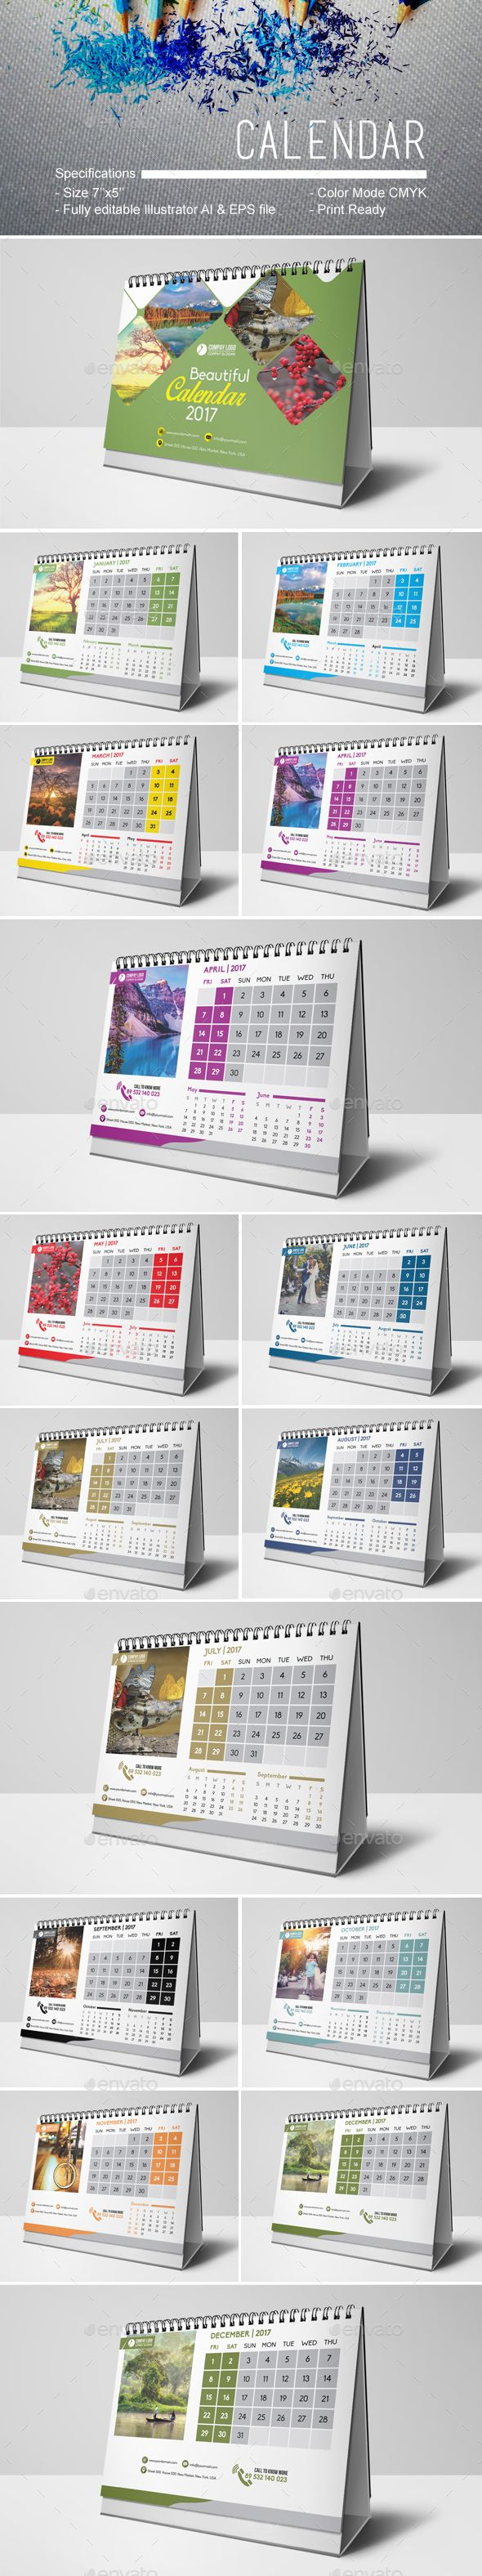 Calendar 2017 Template Vector EPS, AI Illustrator